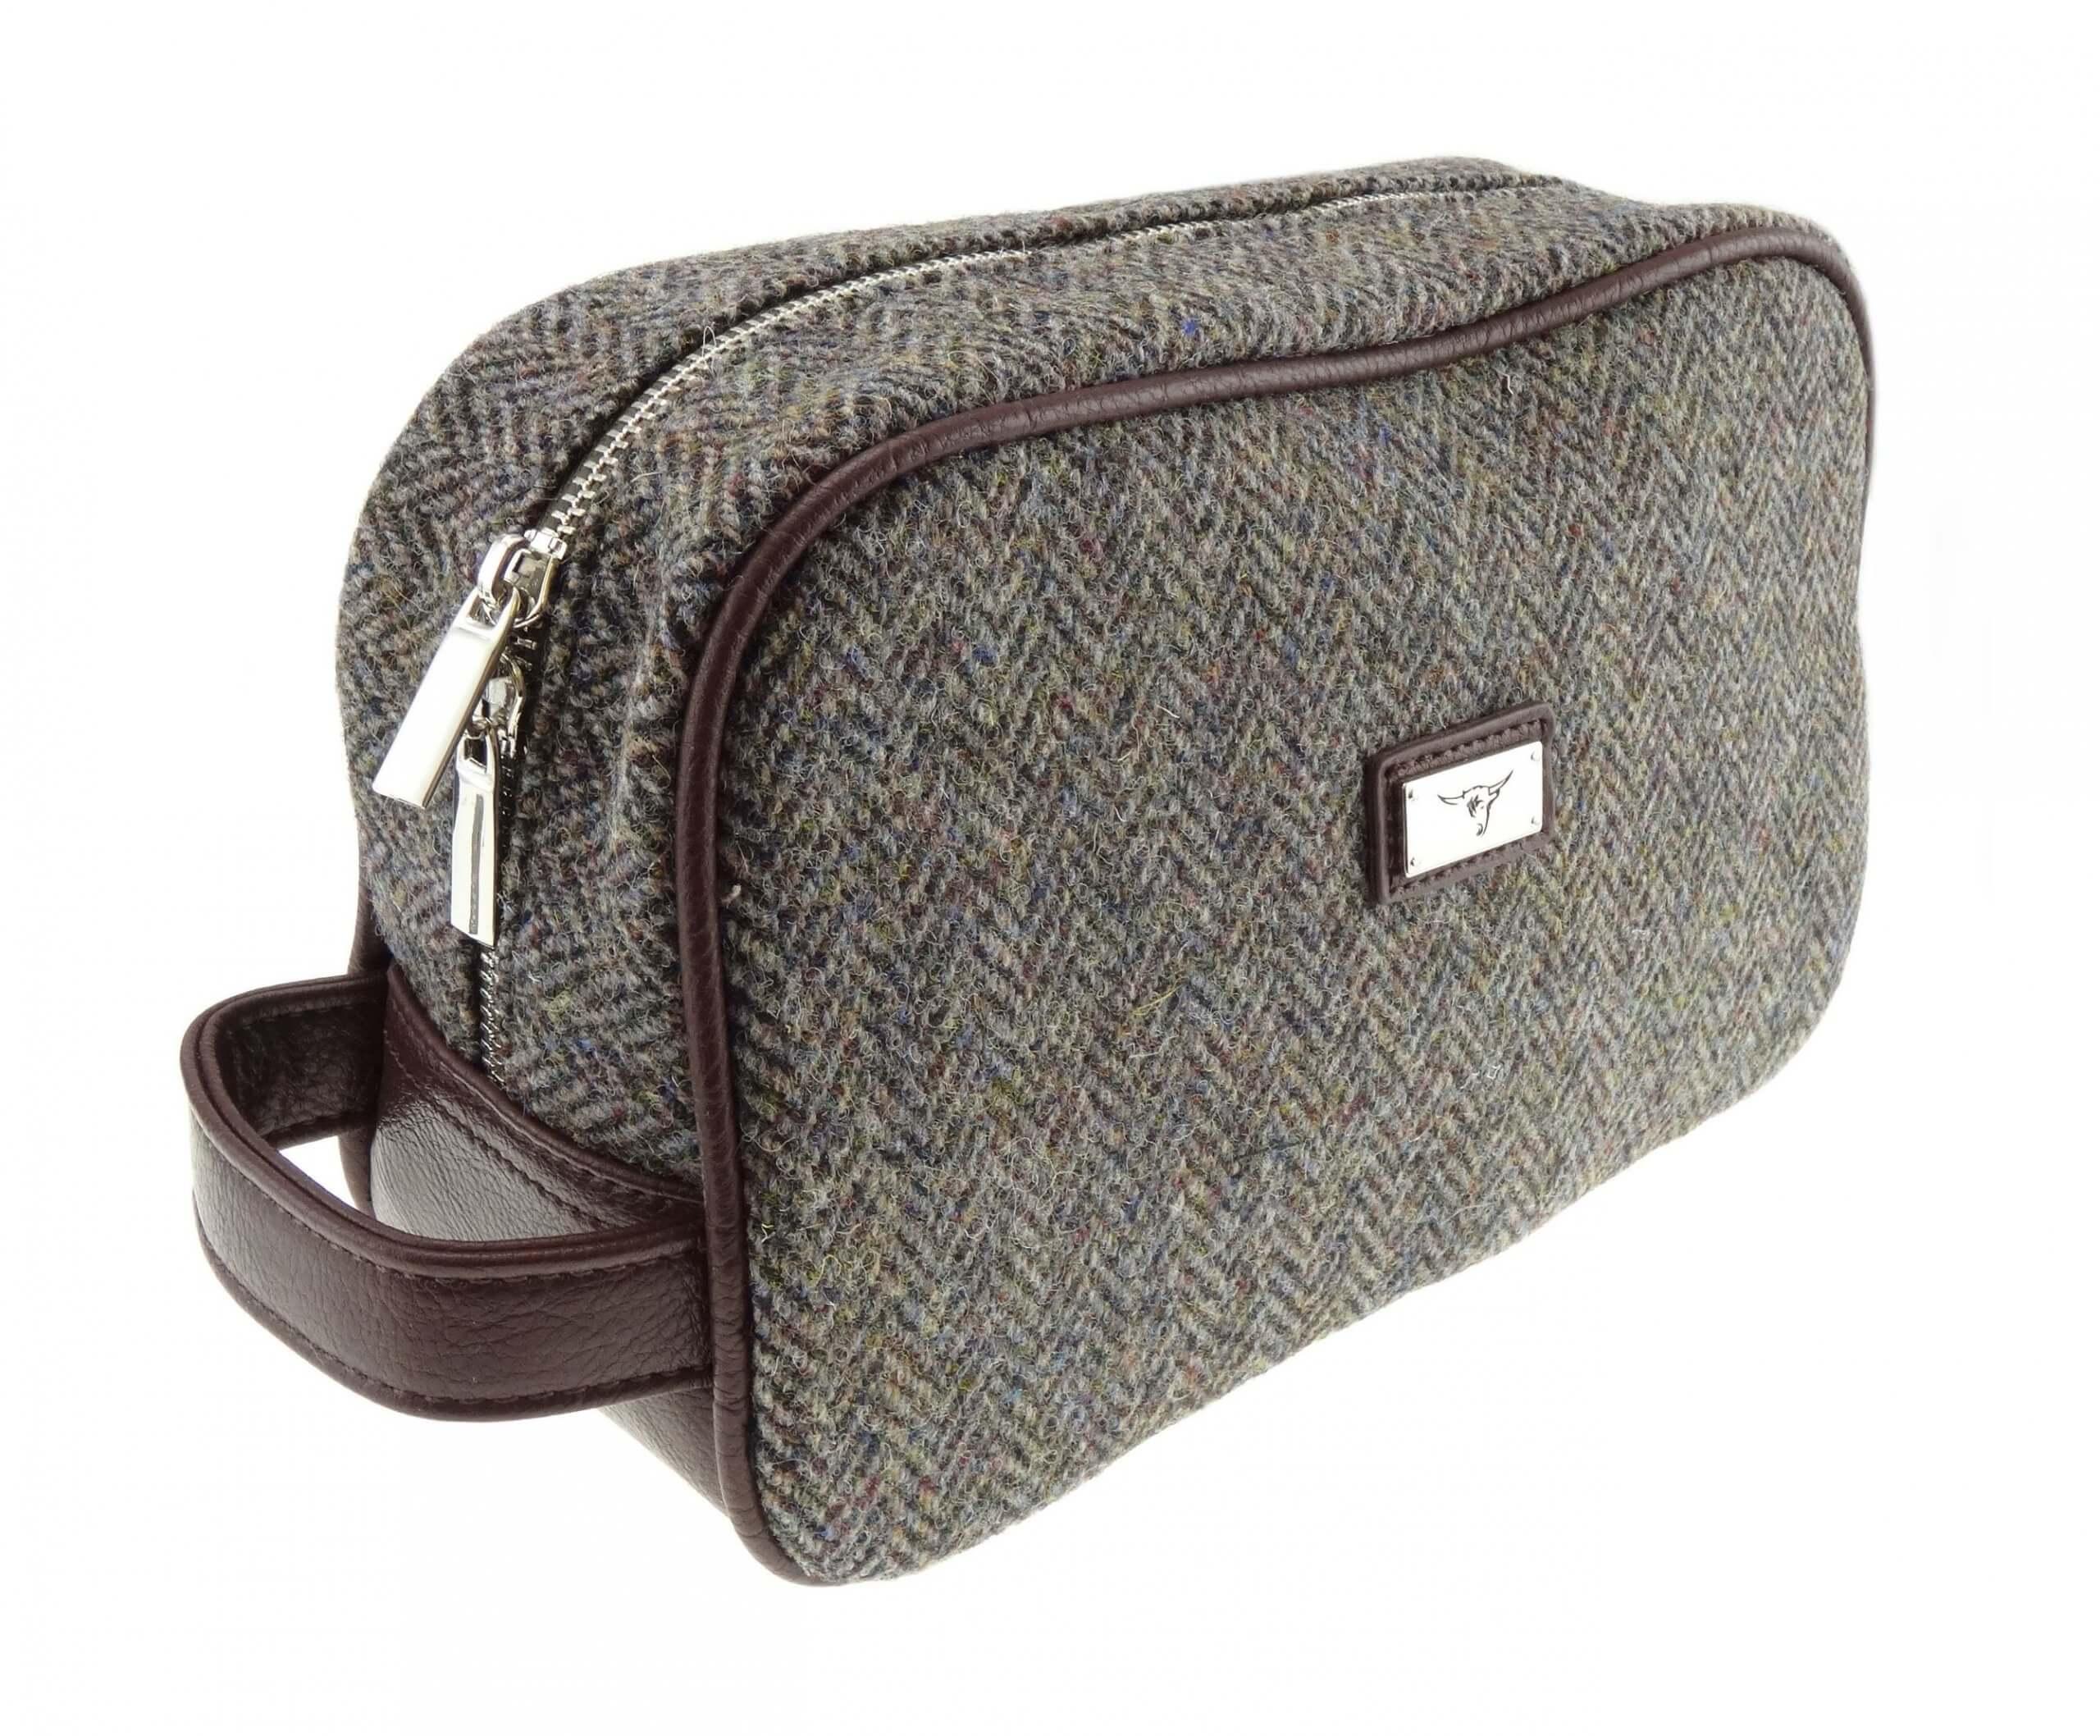 Harris Tweed Wash Bag LB2102-COL7